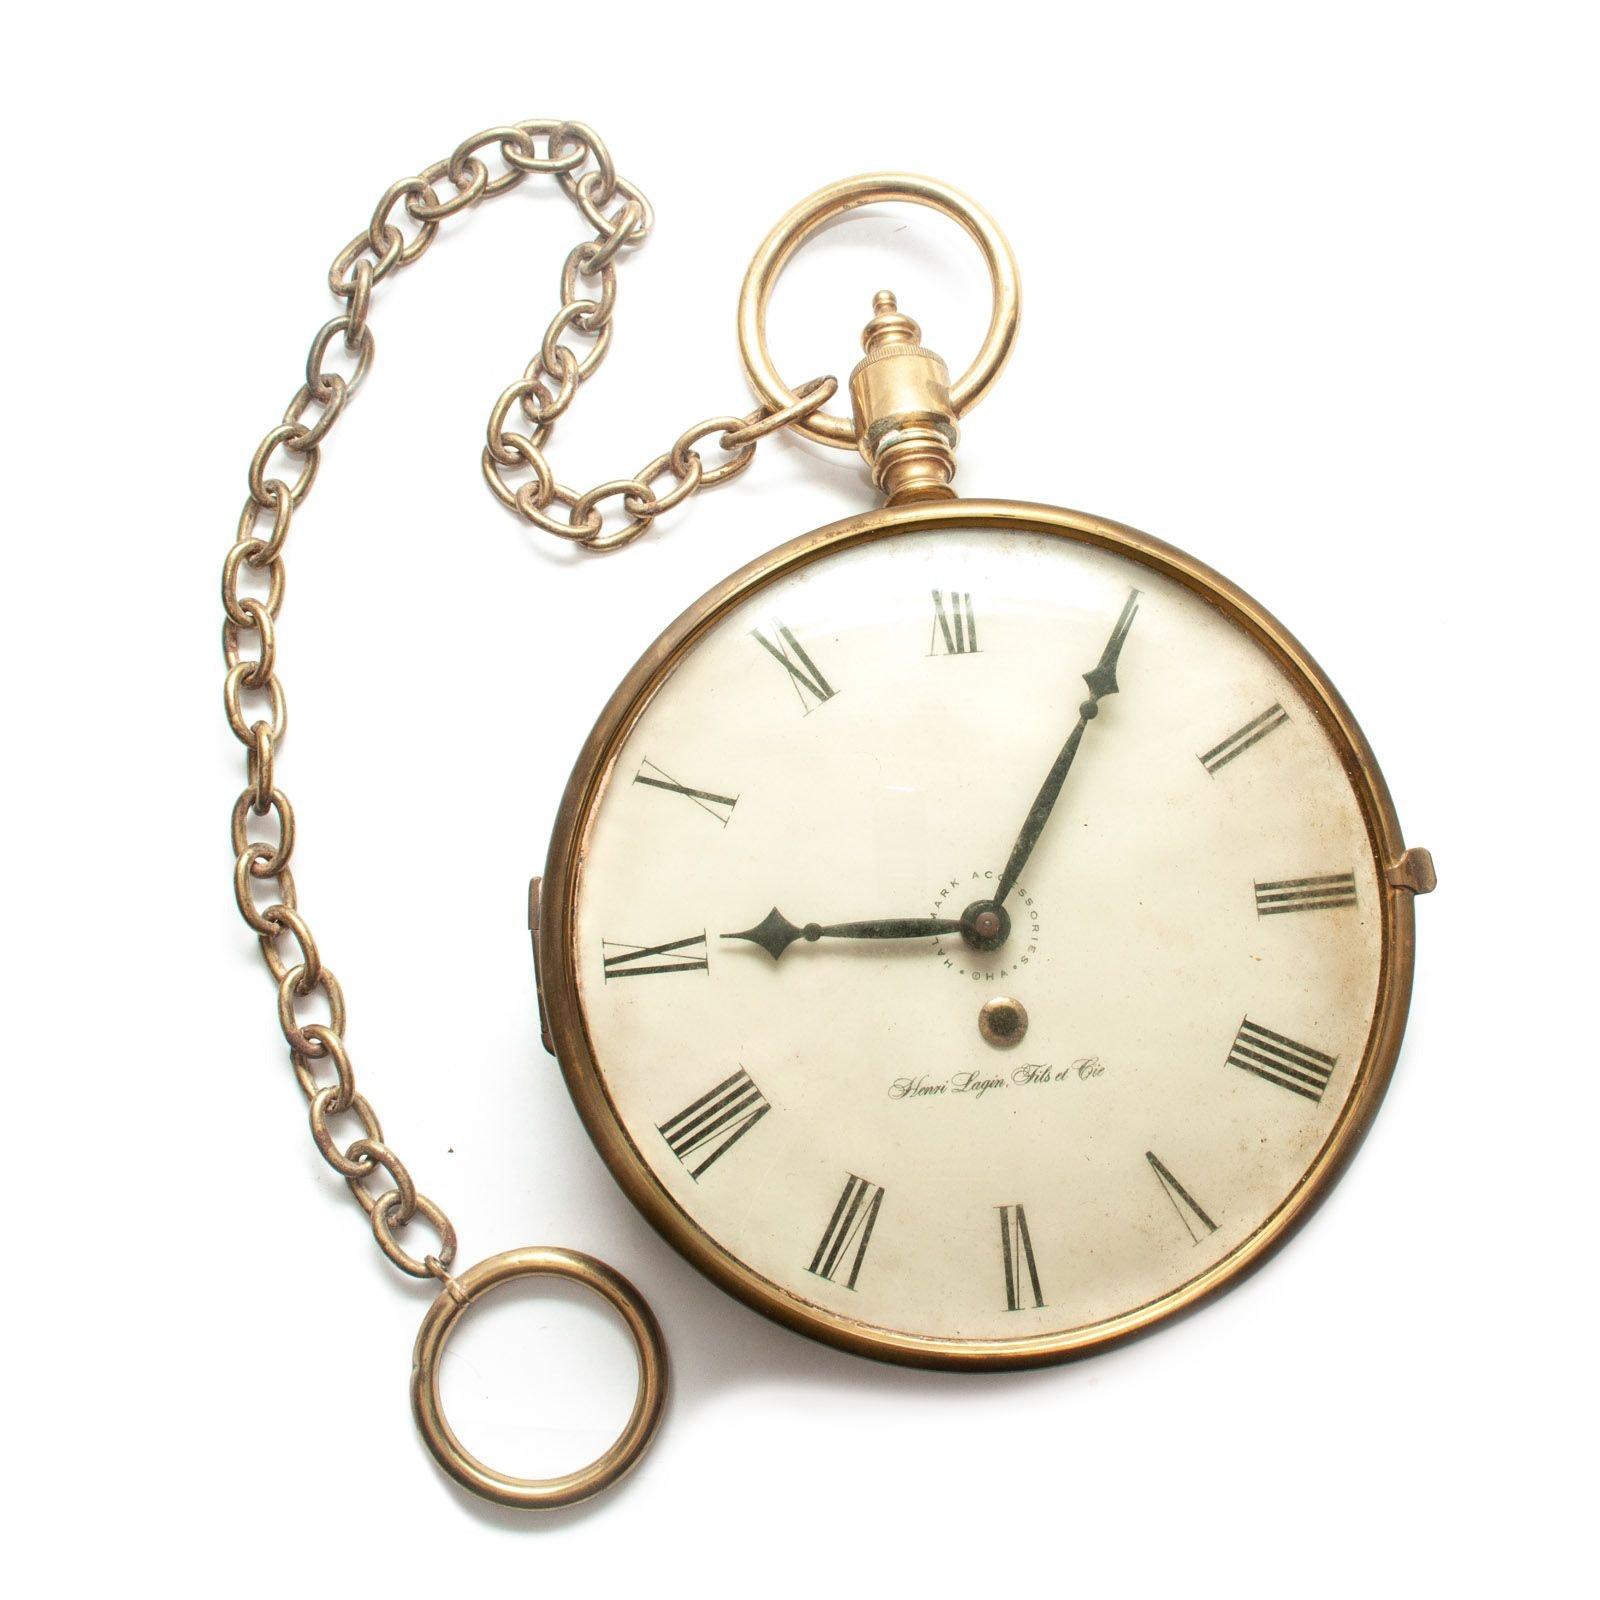 Hallmark Pocket Watch Style Wall Clock